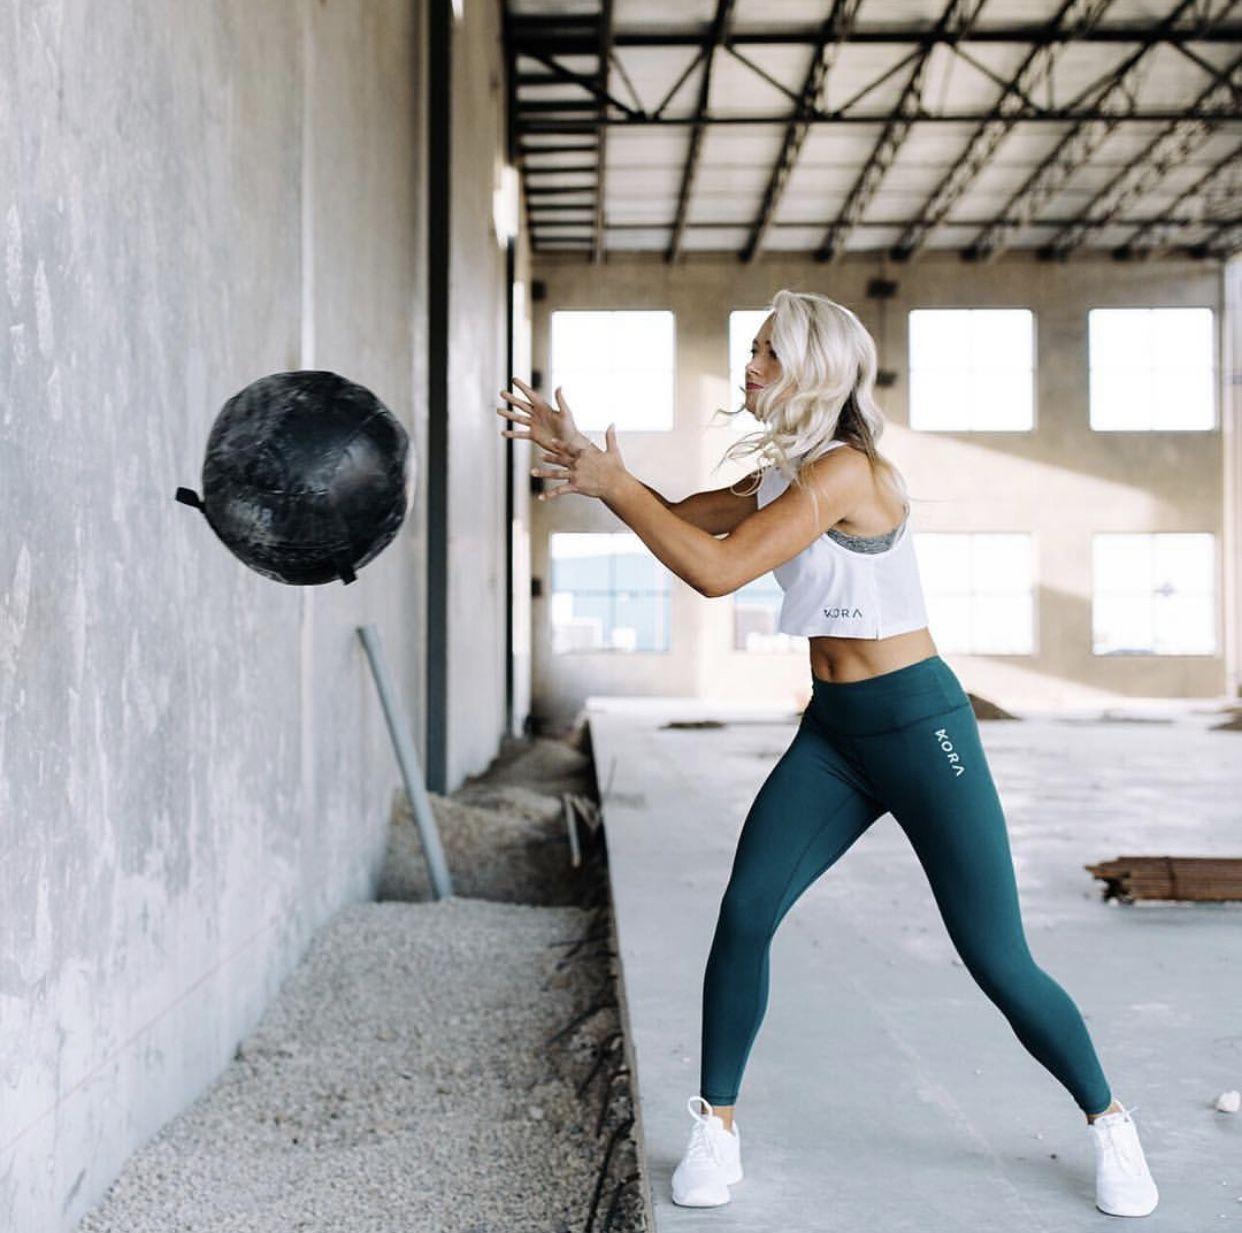 Acta Seamless Legacy Sports Bra Ocean Acta Usa Seamless Leggings Gym Wear For Women Fashion